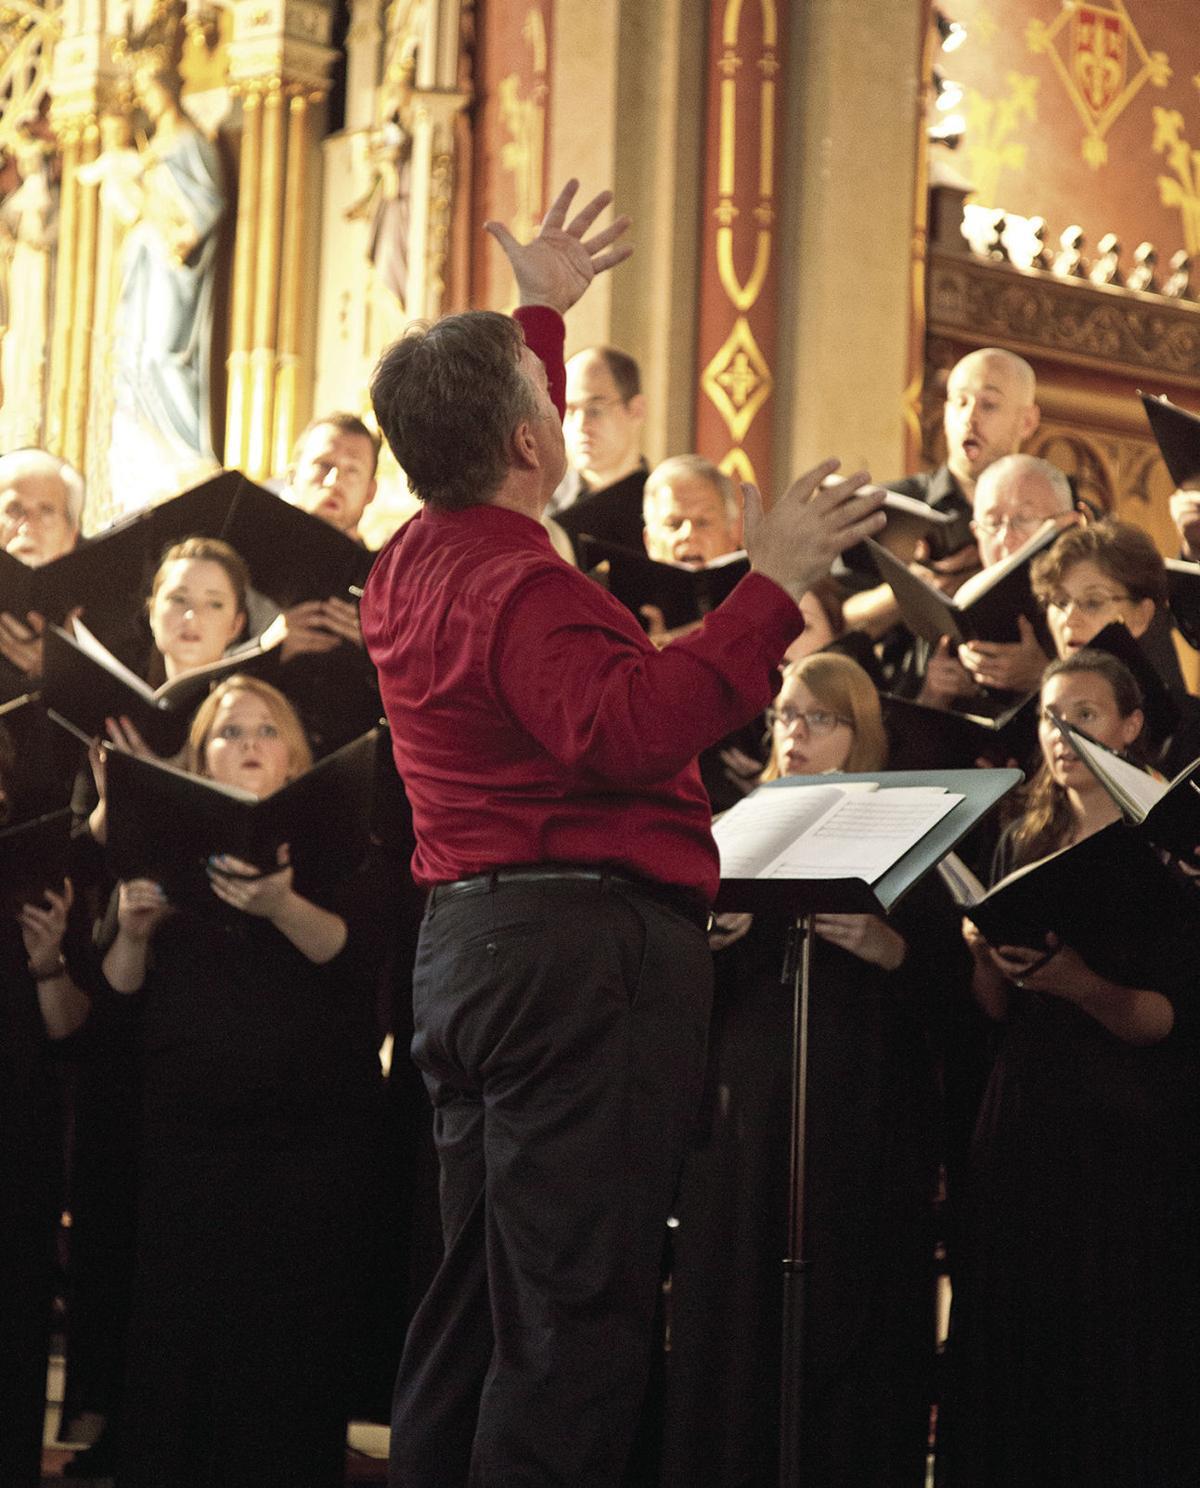 St. Louis Chamber Chorus